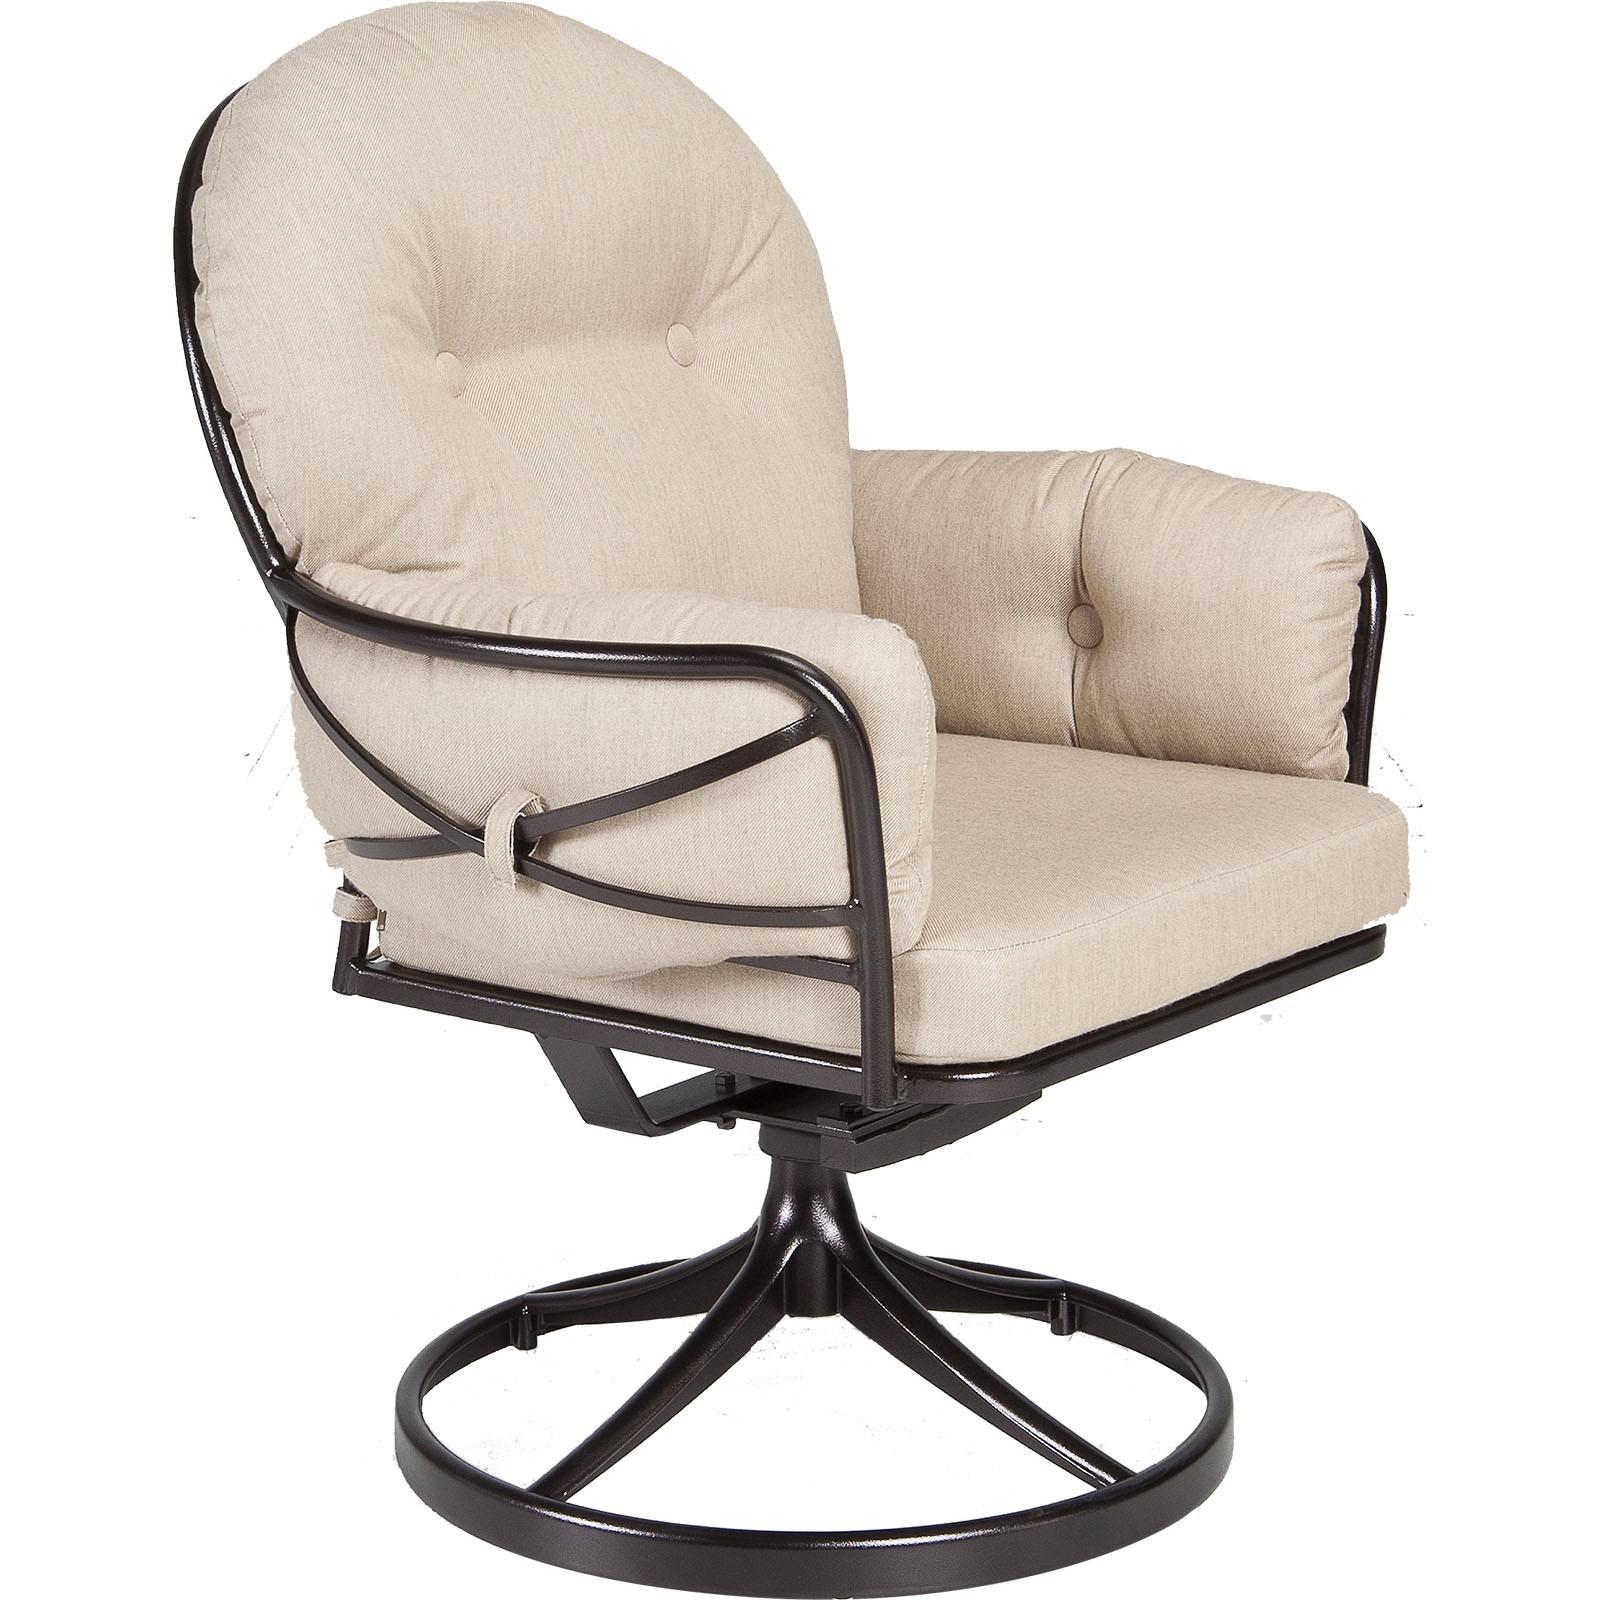 Cambria Club Swivel Rocker Dining Arm Chair Hauser S Patio